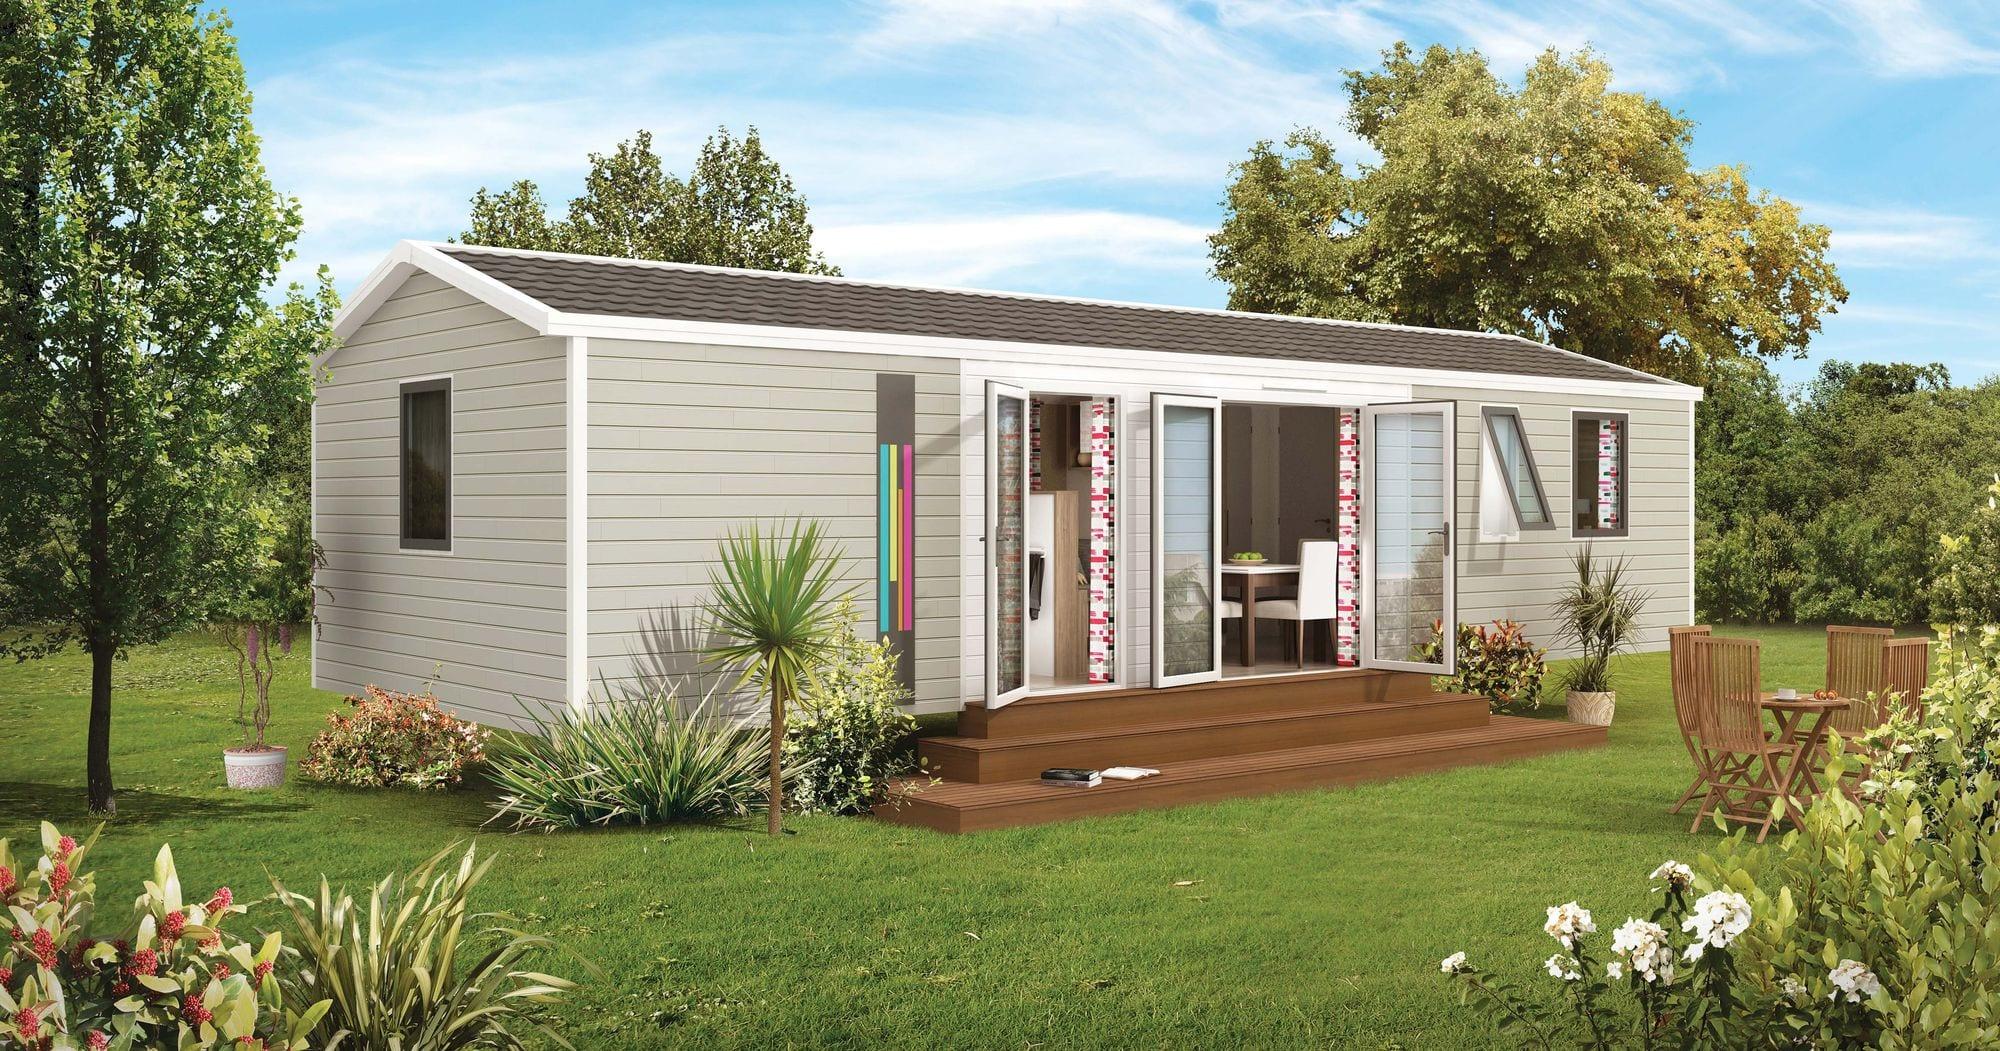 ridorev genoa trio espace mobil home neuf residentiel. Black Bedroom Furniture Sets. Home Design Ideas